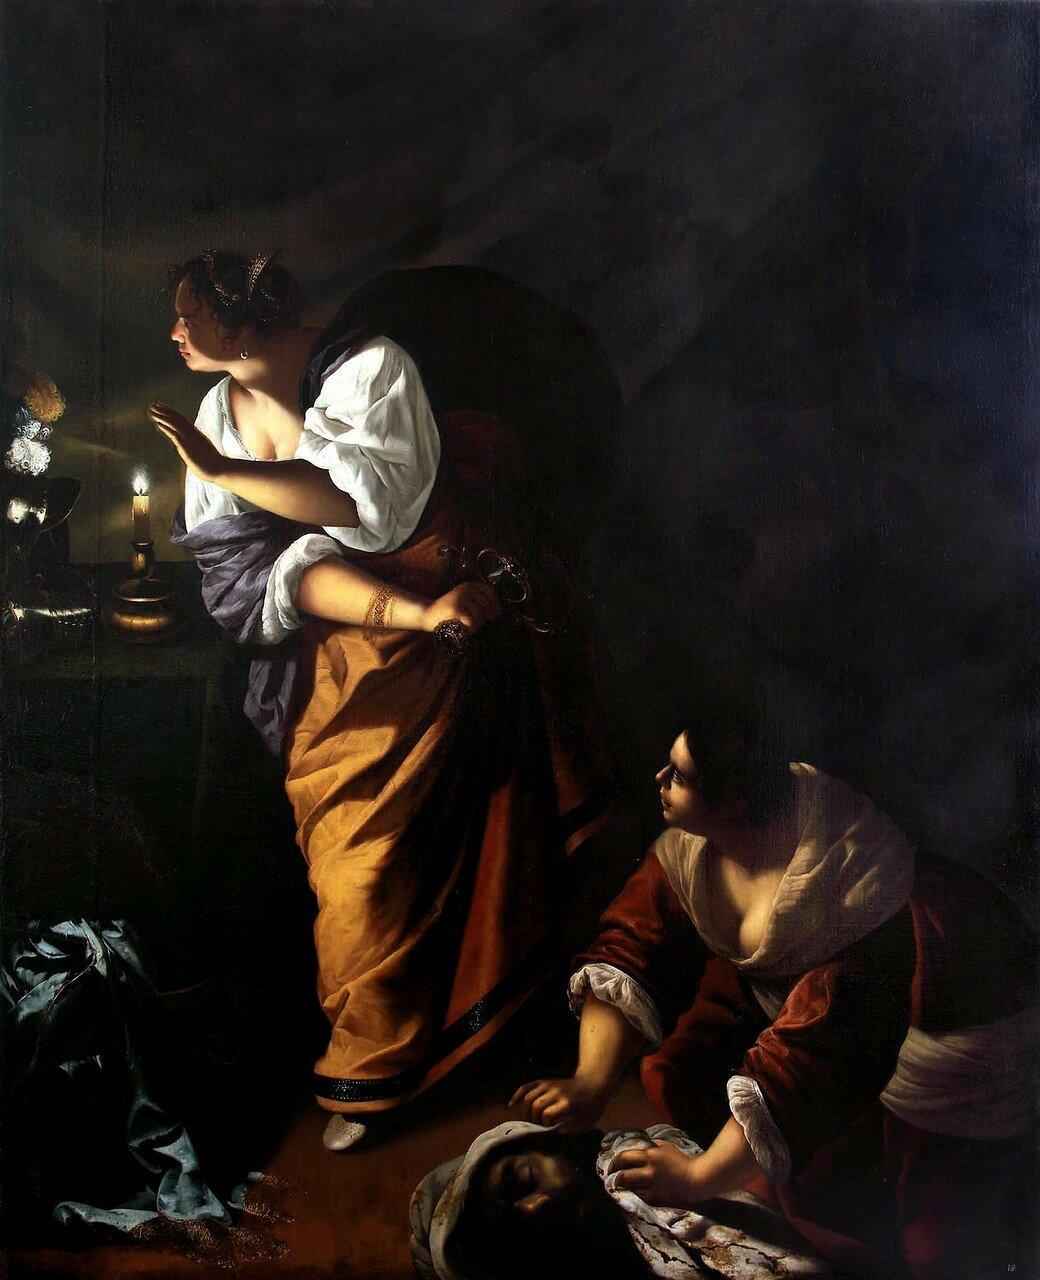 Artemisia Gentileschi / Артемизия Джентилески (1593-1653) - Giuditta e la fantesca Abra con la testa di Oloferne / Юдифь и её служанка Абра с головой Олоферна ( около 1645-1650)